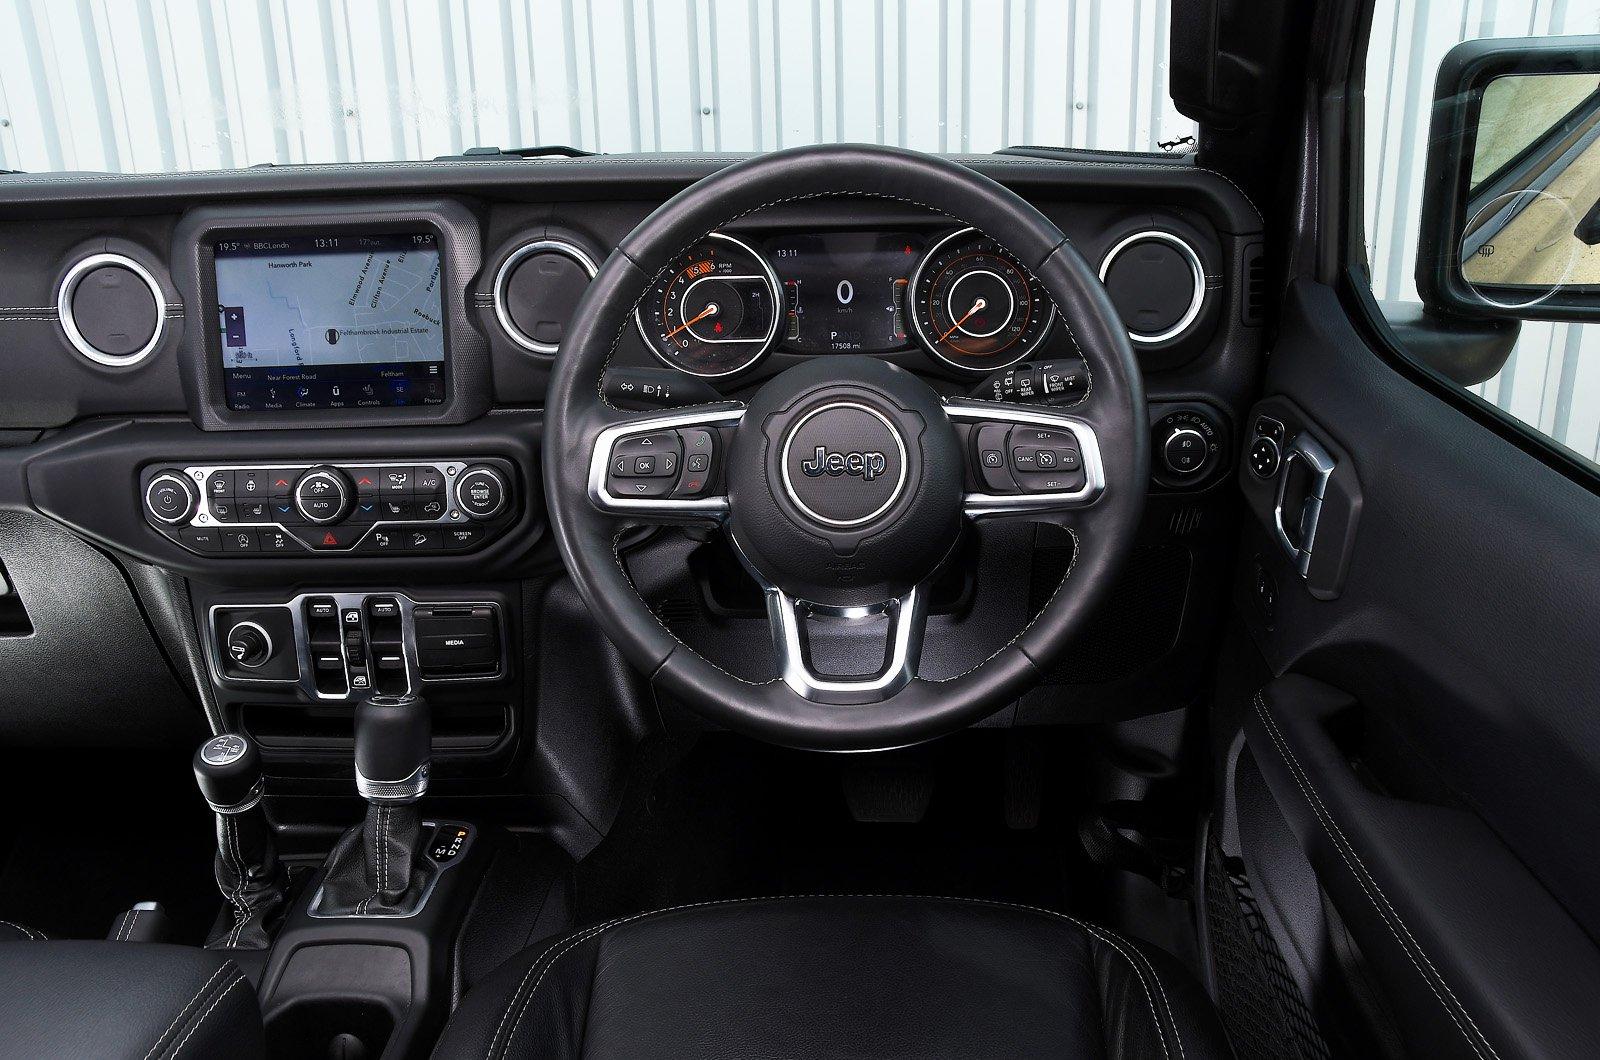 Jeep Wrangler dashboard